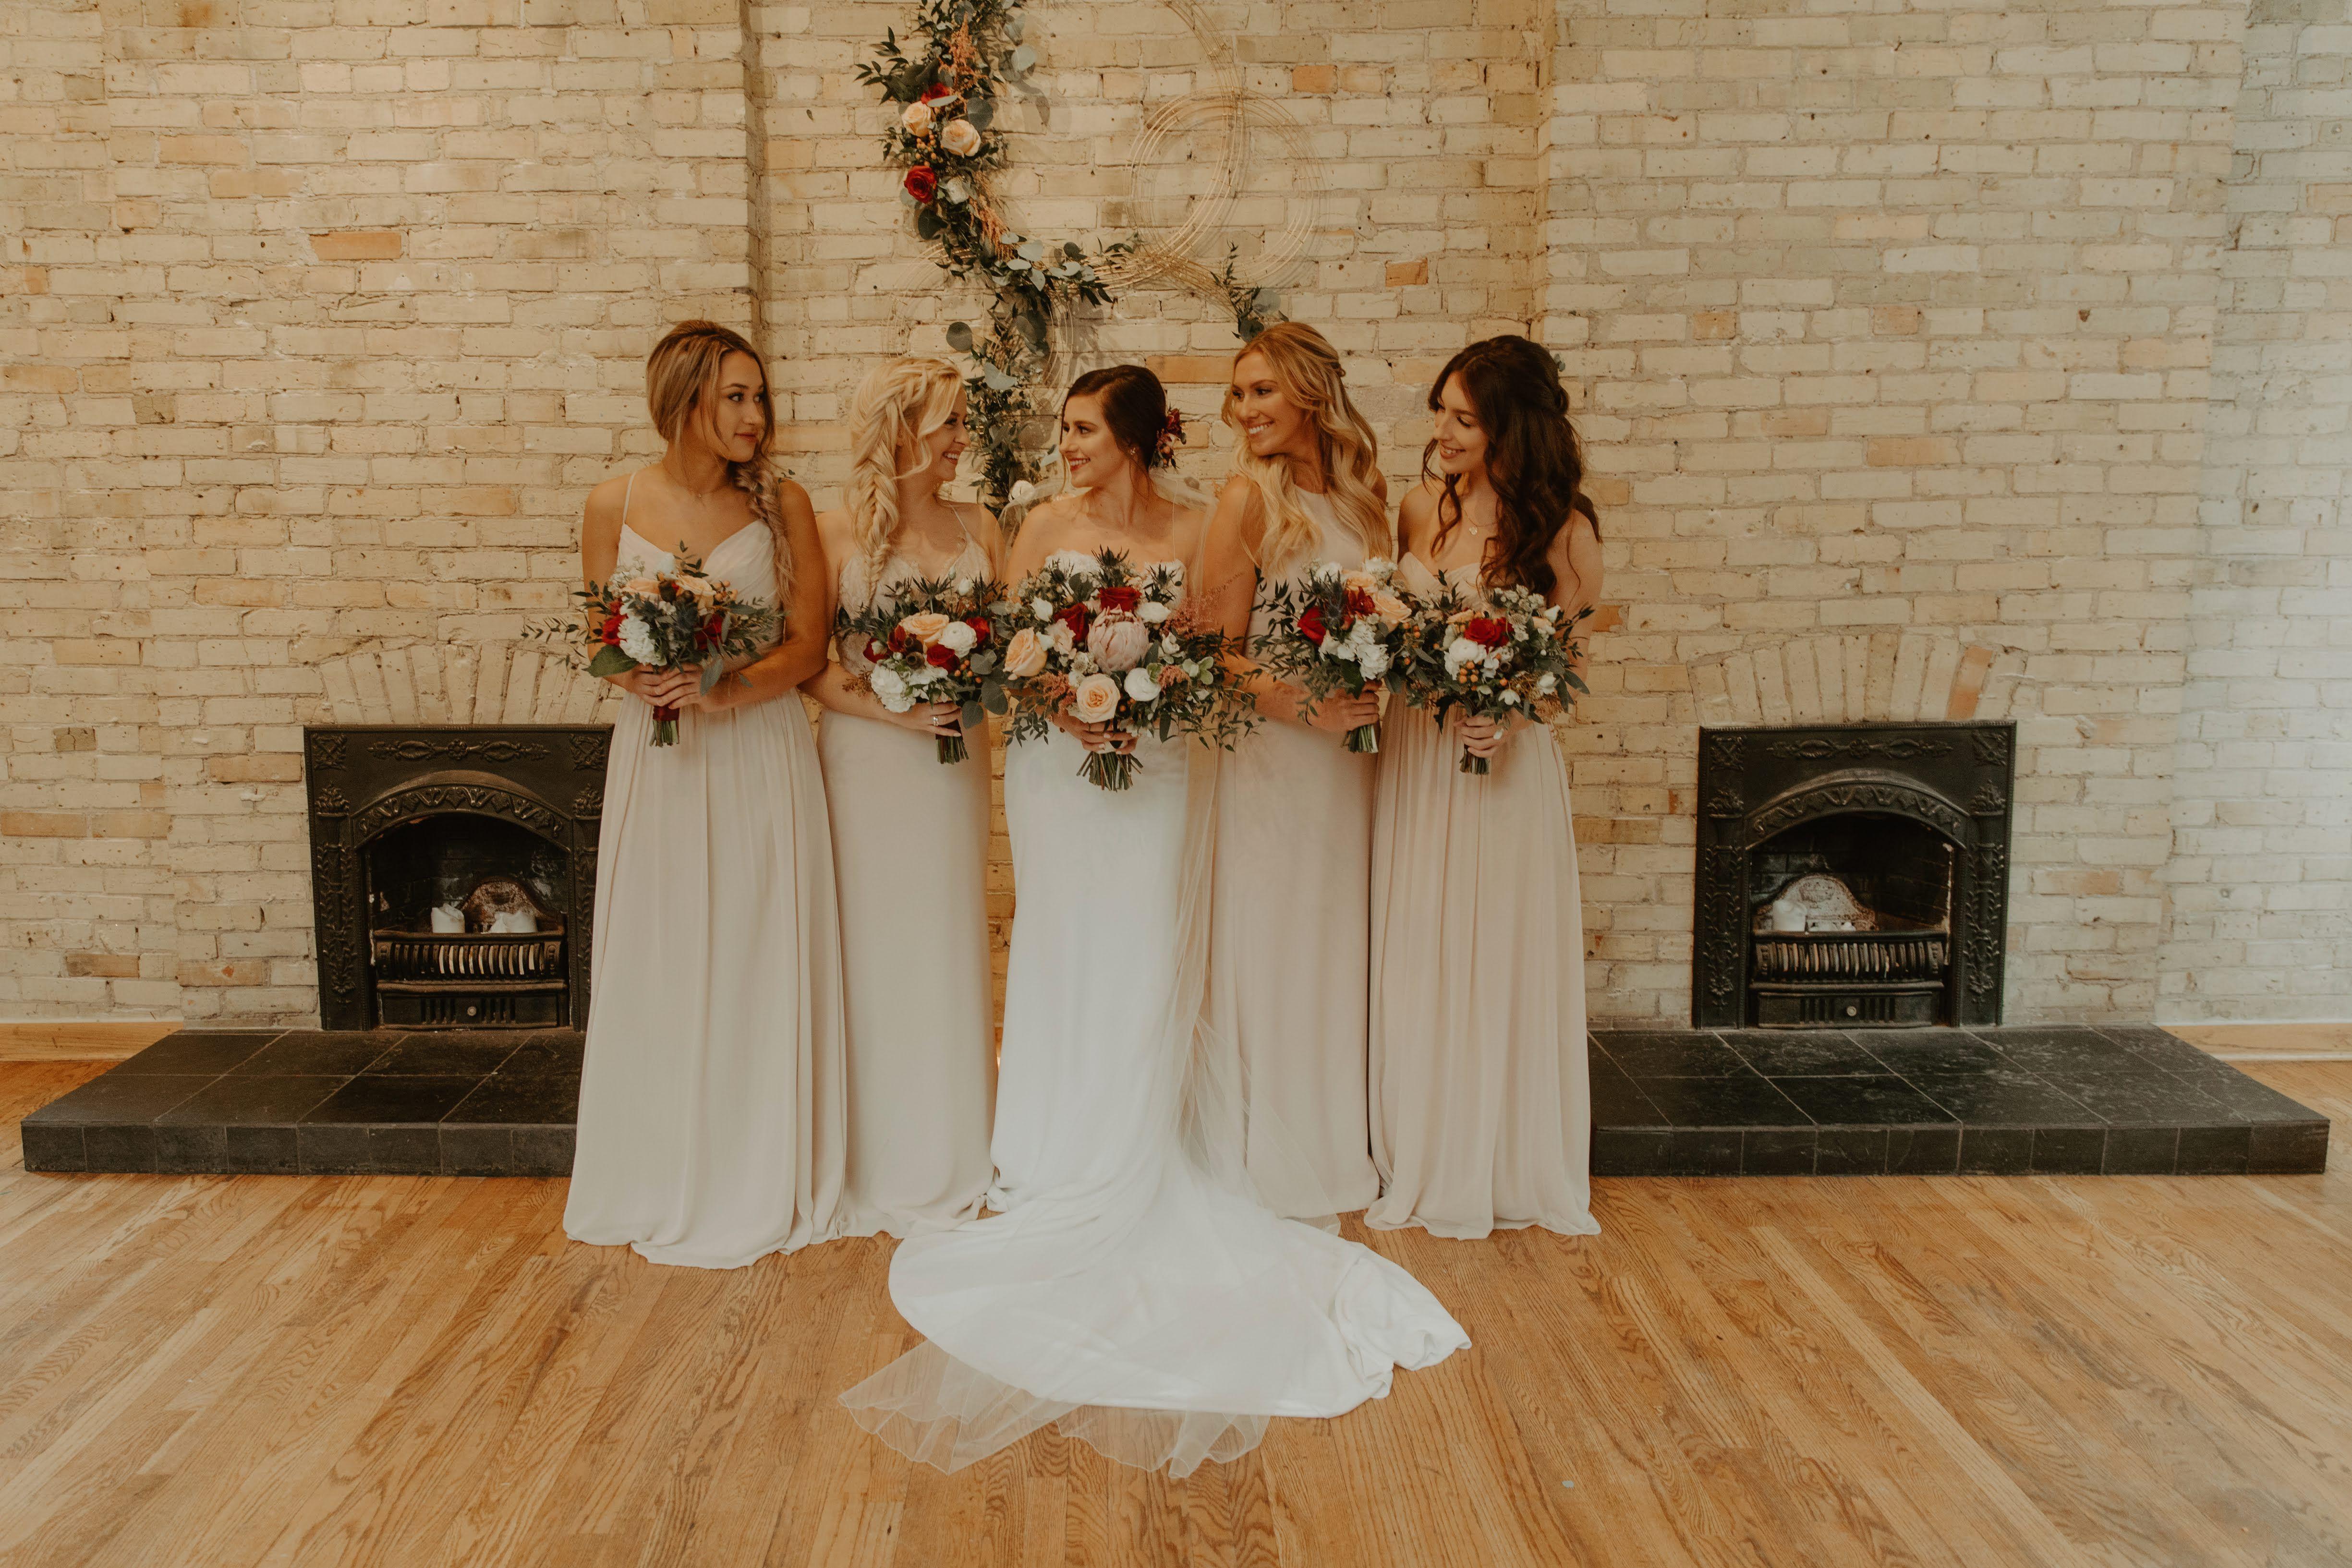 Downtown Milwaukee Wisconsin Wedding At Onesto Rustic Bridesmaid Dresses Brides Bridesmaids Neutral Bridesmaid Dresses